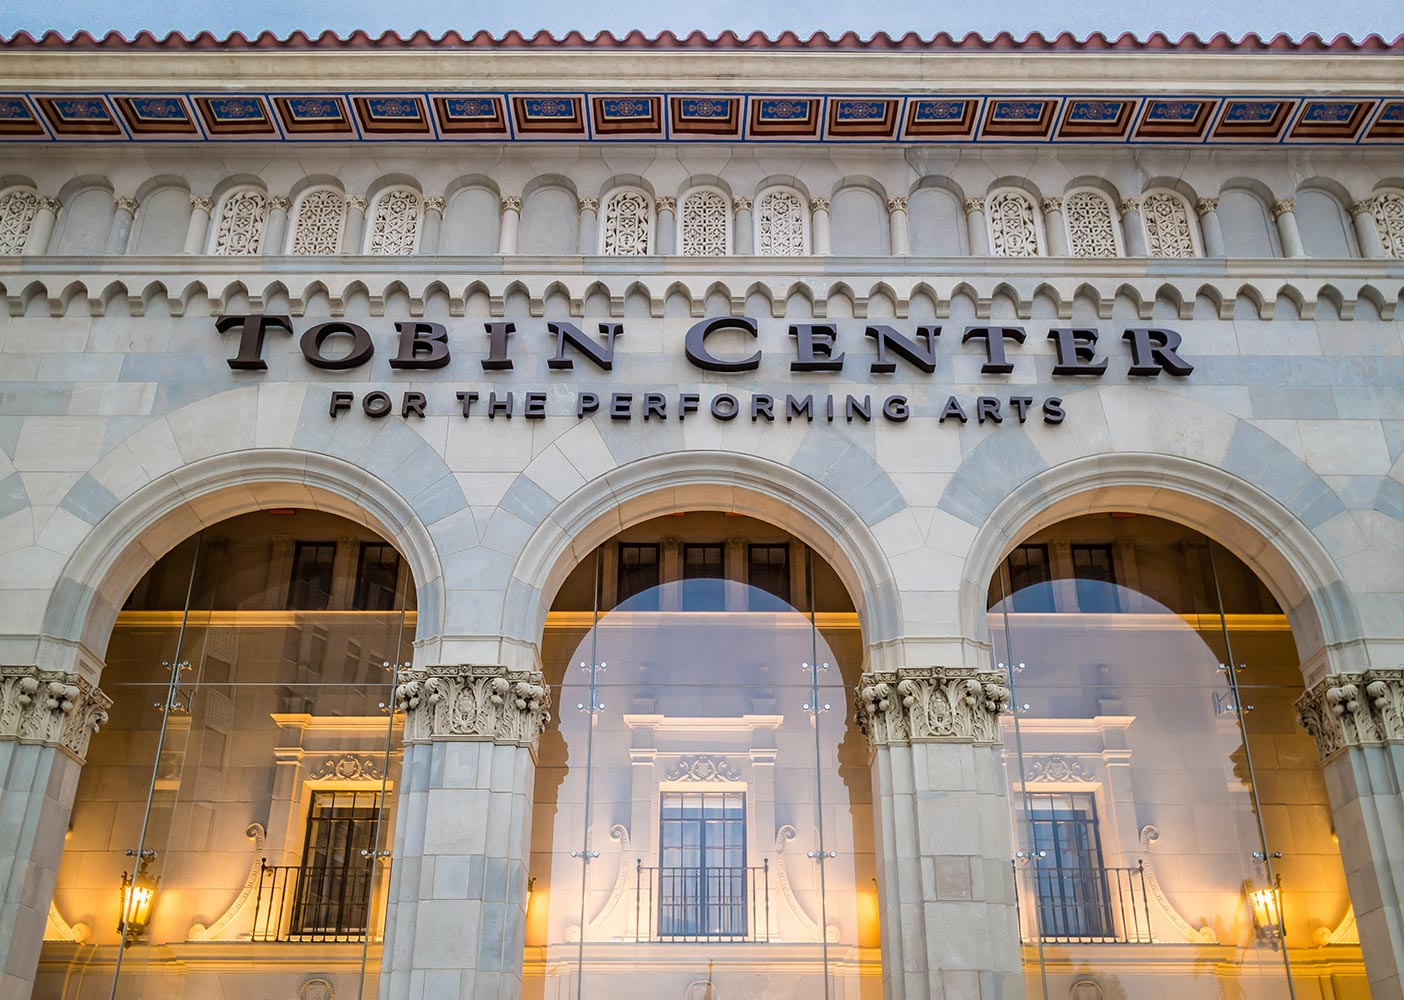 TobinCenter03.jpg